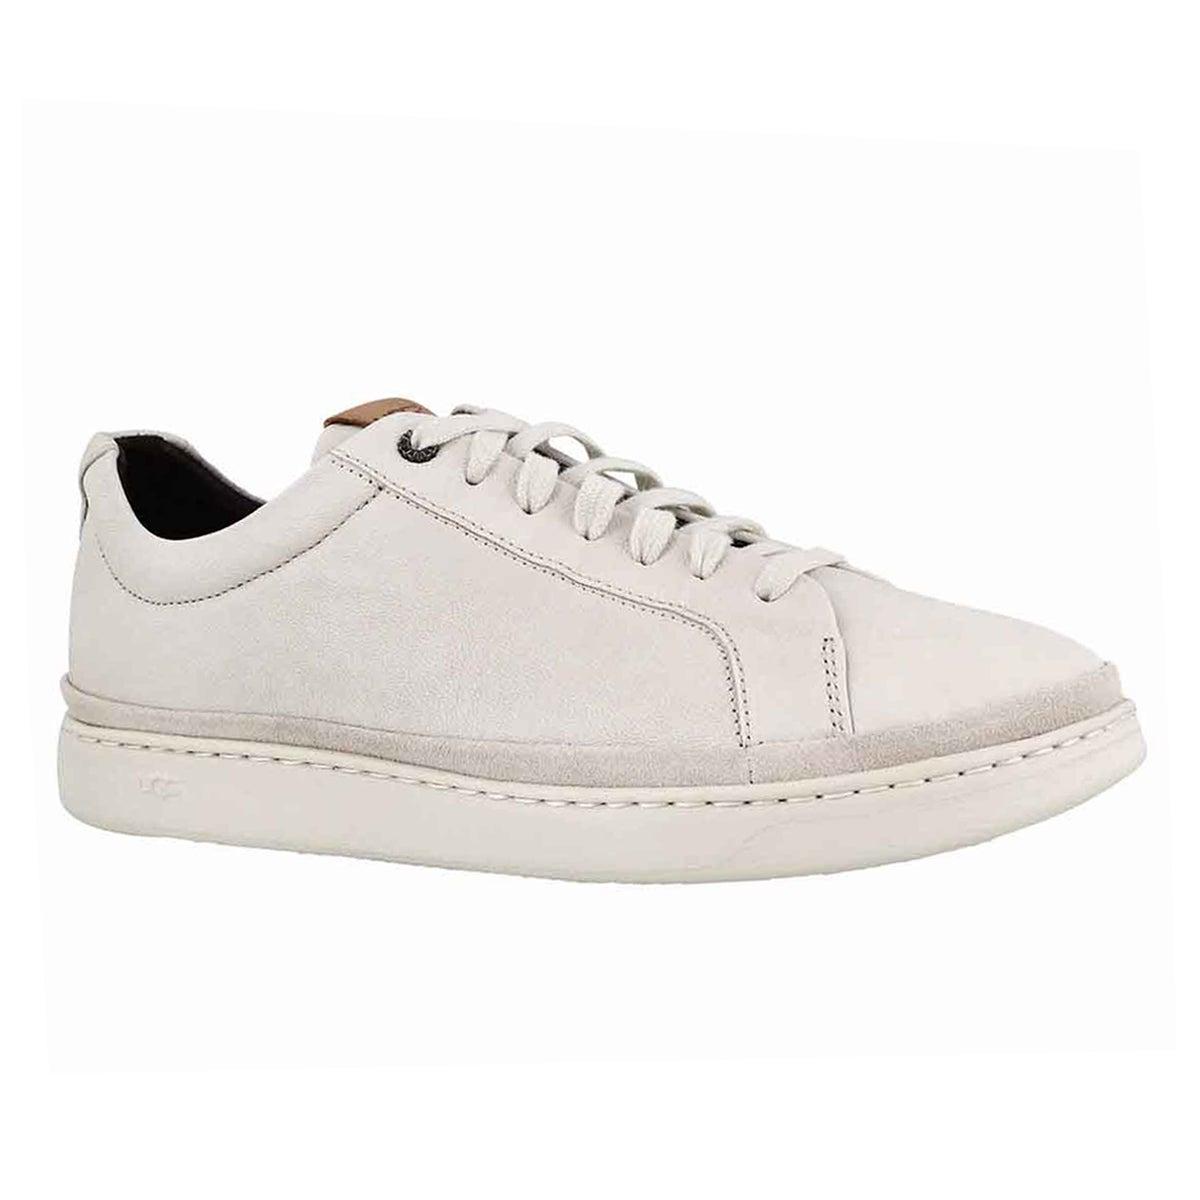 Men's CALI SNEAKER LOW parchment sneakers